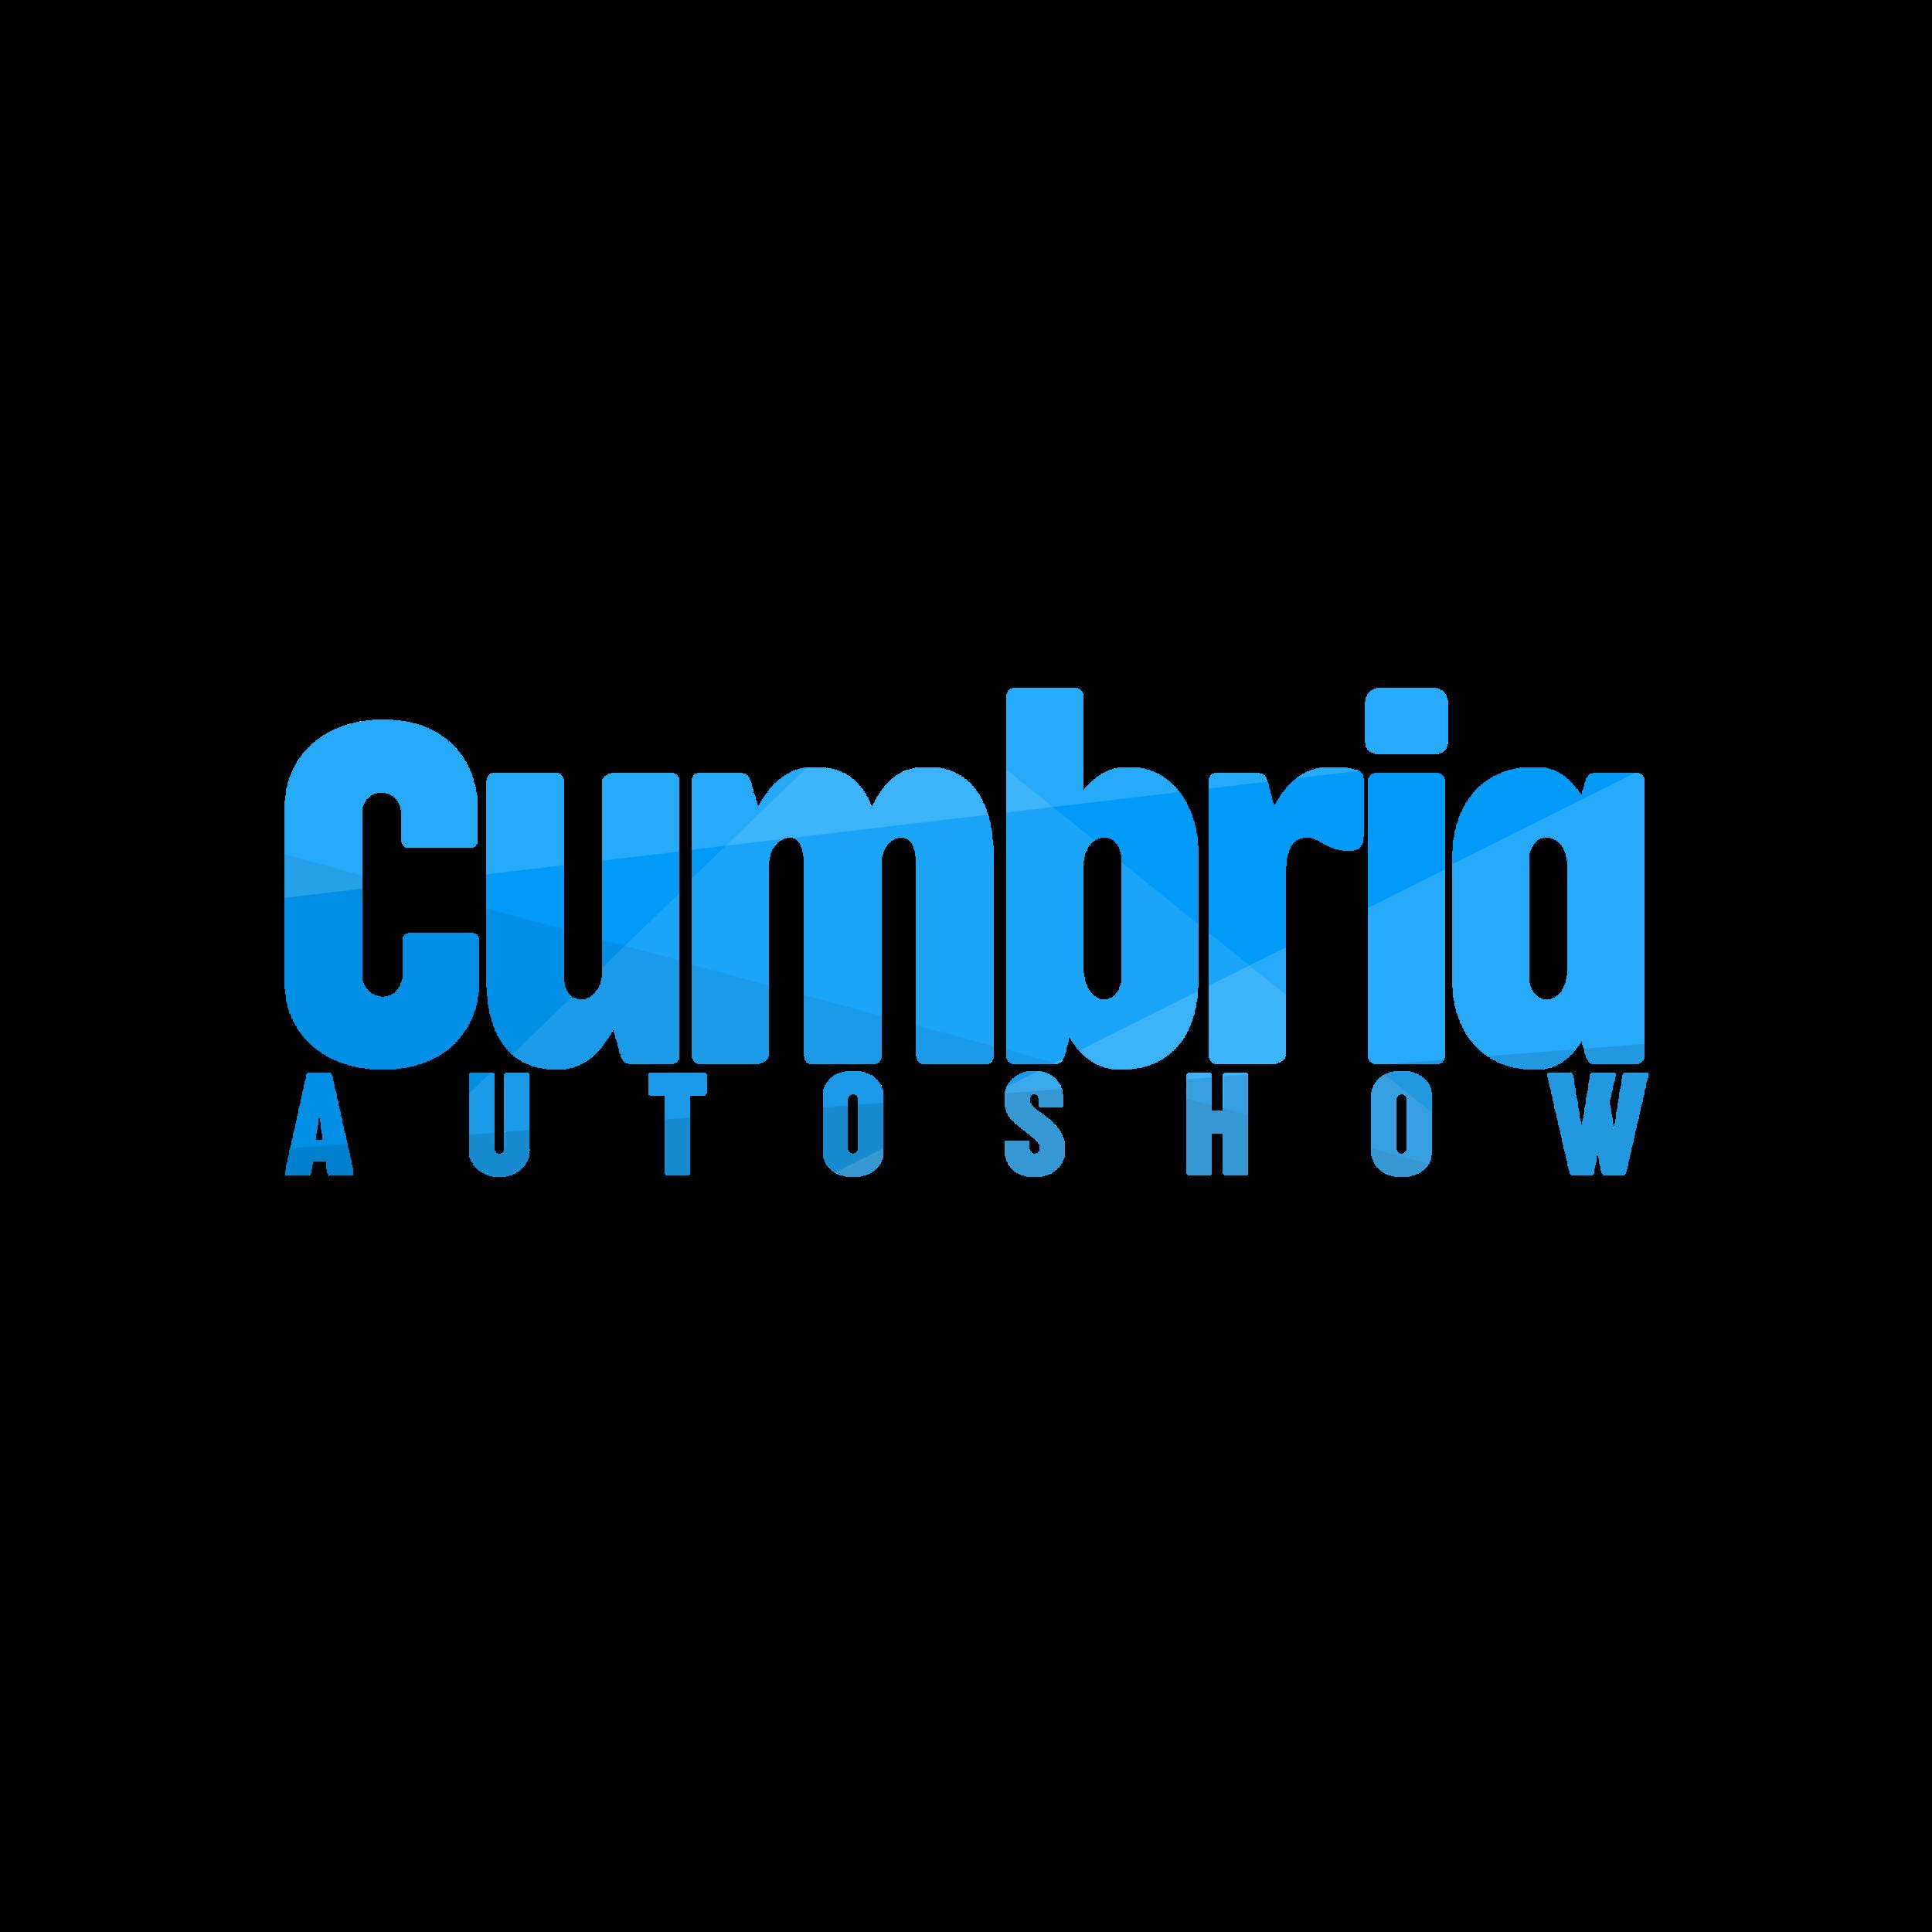 Cumbria Auto Show Logo.png